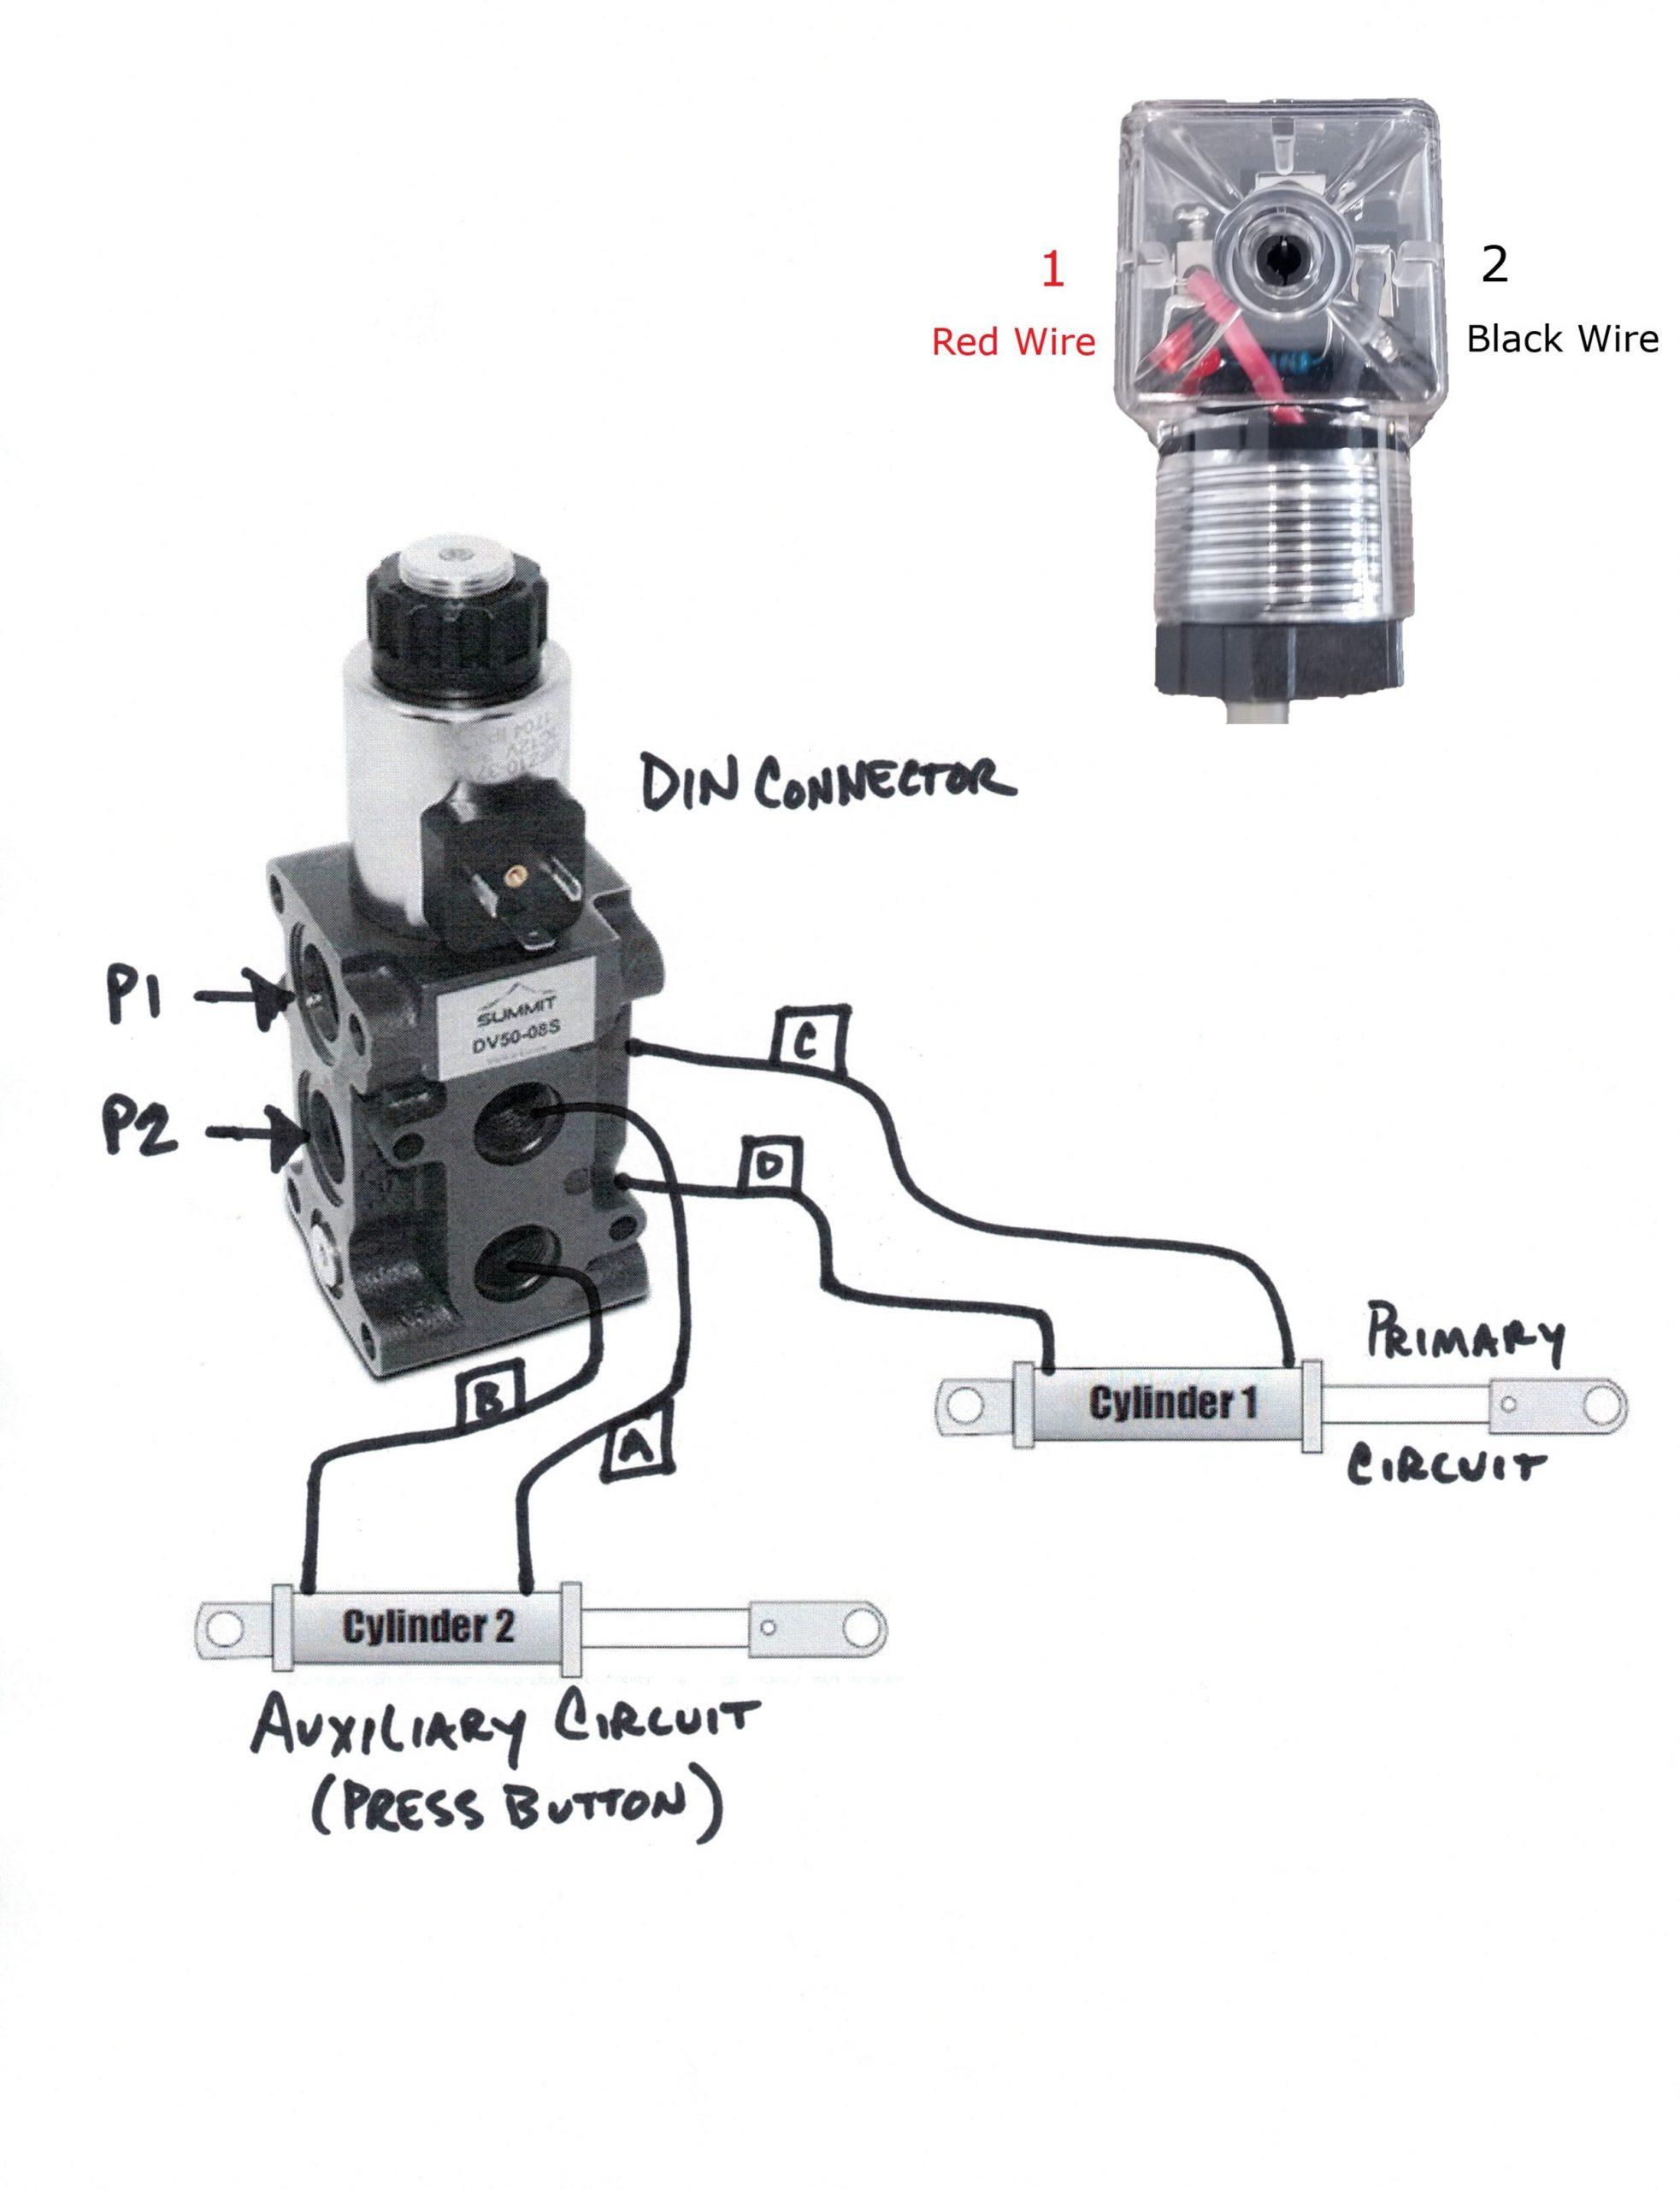 Hydraulic Solenoid Selector DV50 Instruction Diagram - Summit Hydraulics | Hydraulic Solenoid Wiring Diagram |  | Summit Hydraulics